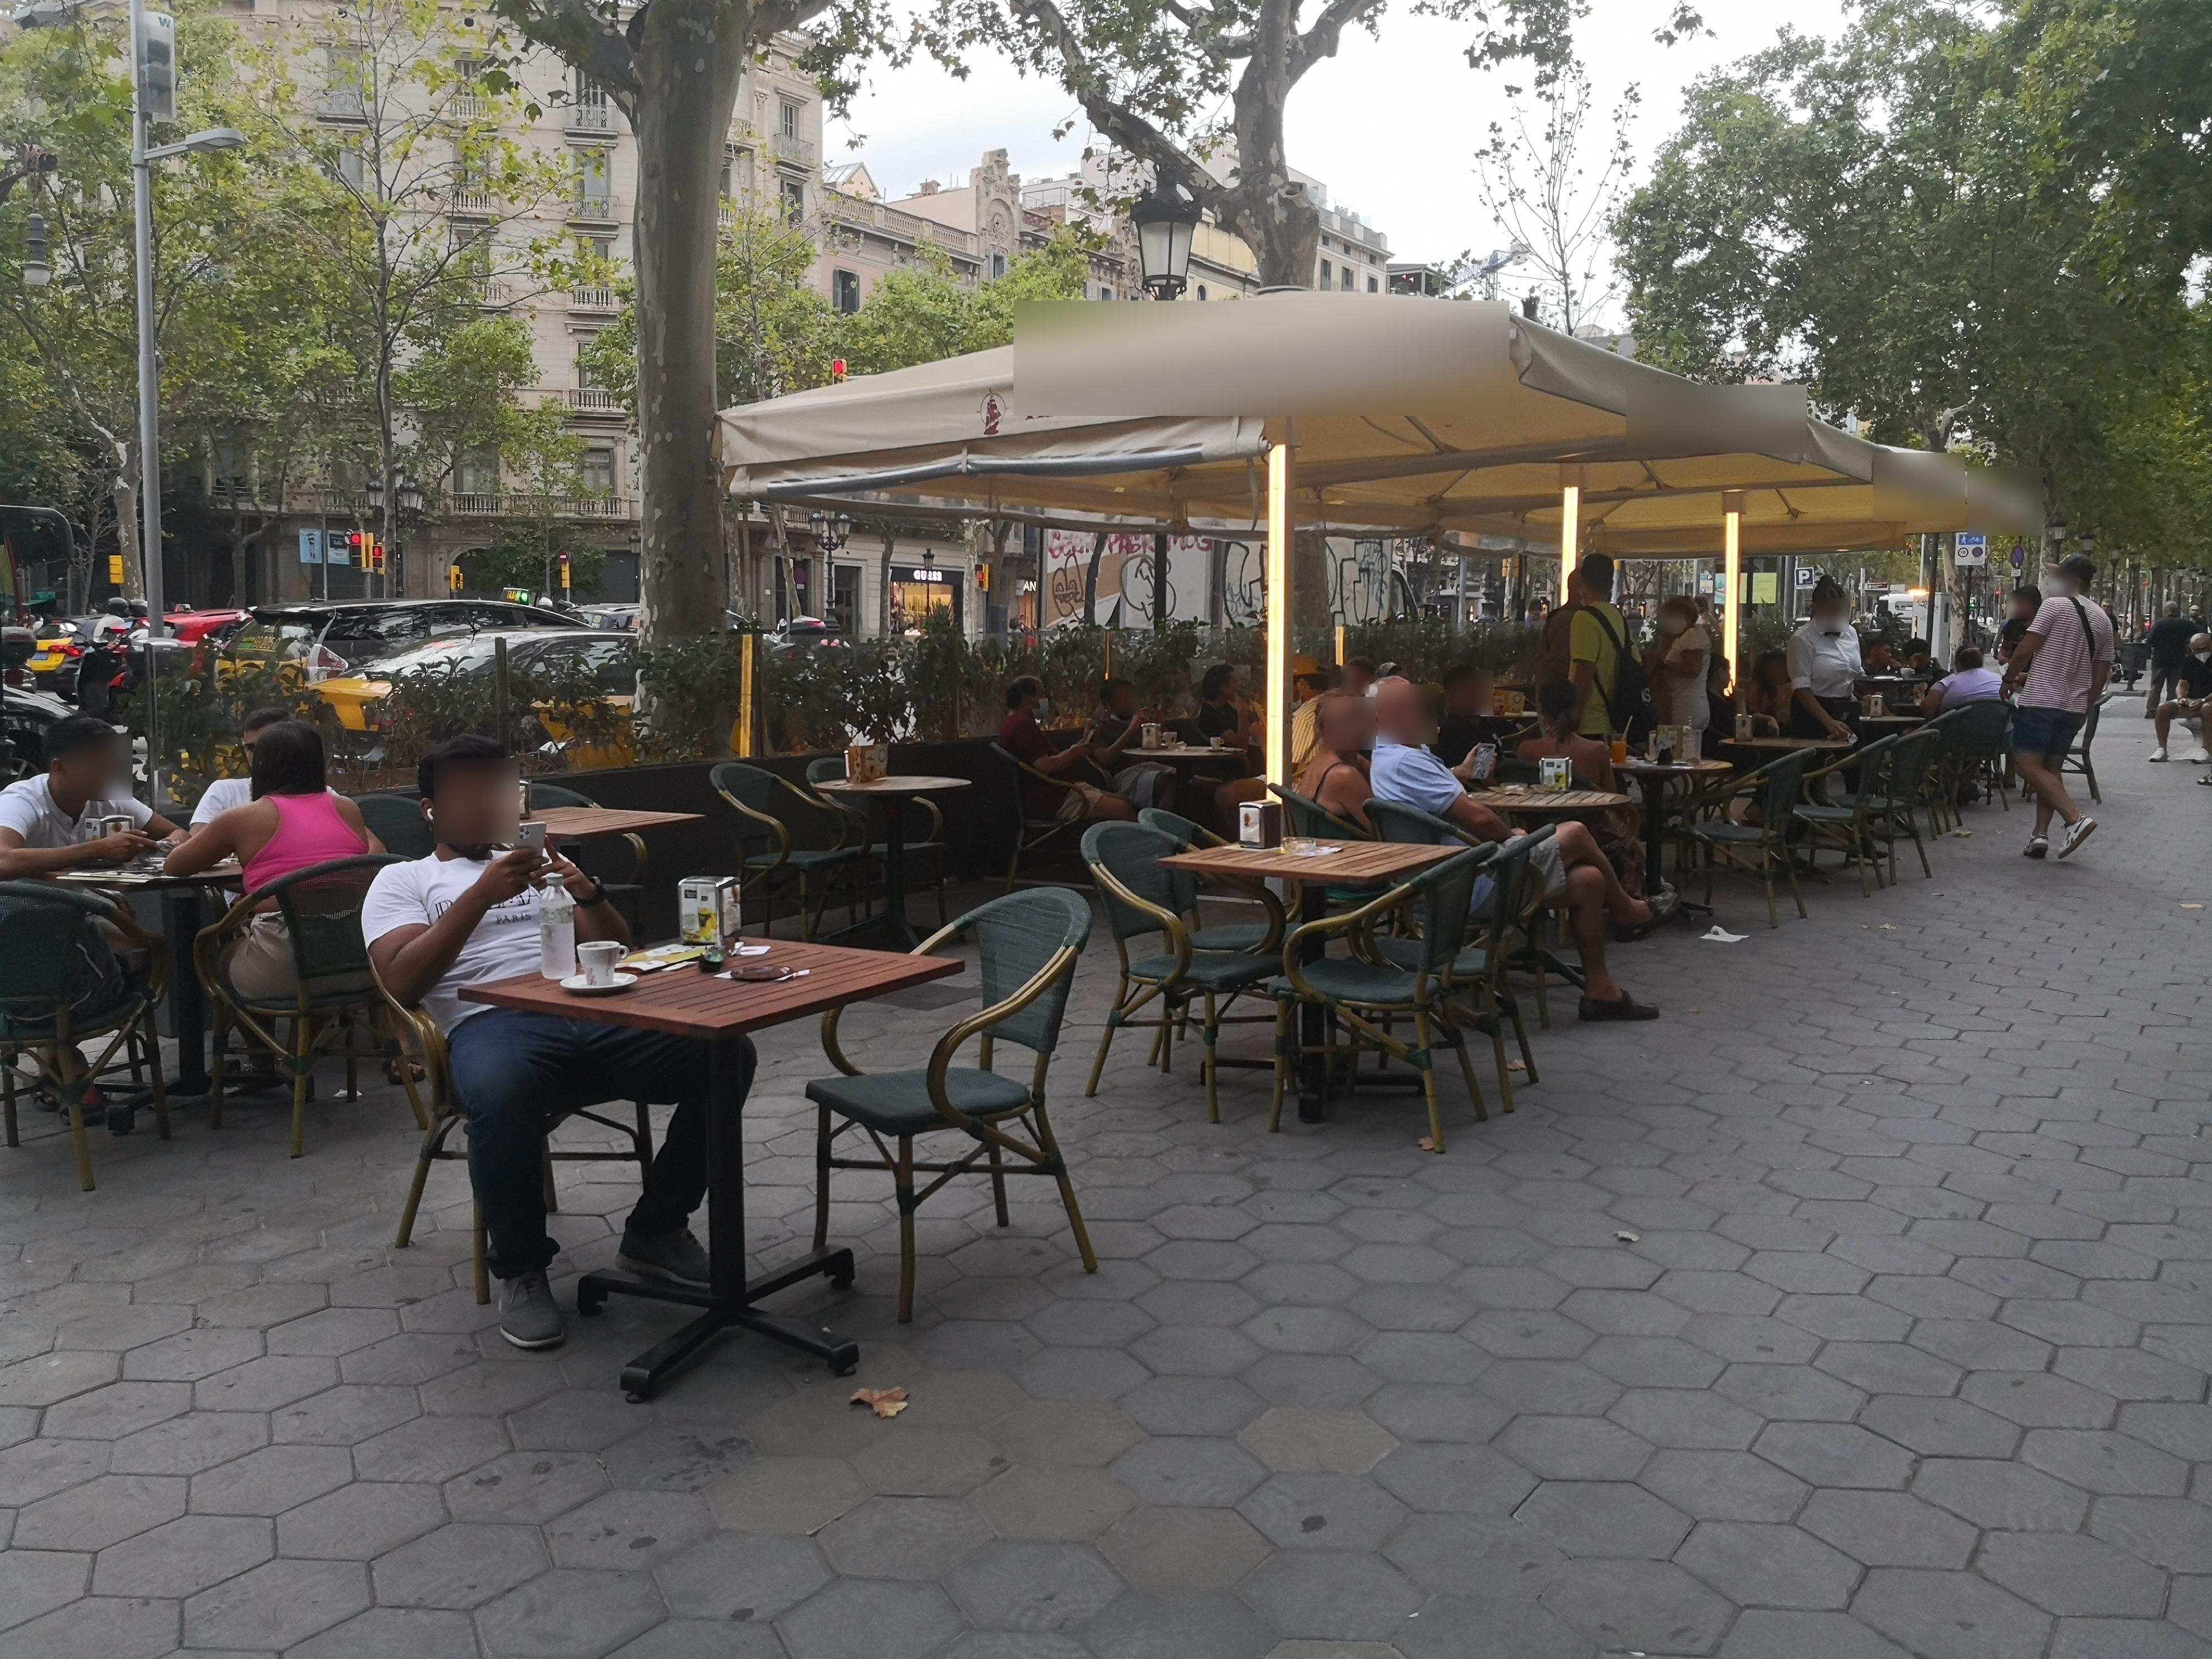 Passeig de Gràcia, 66 - Excés de taules!